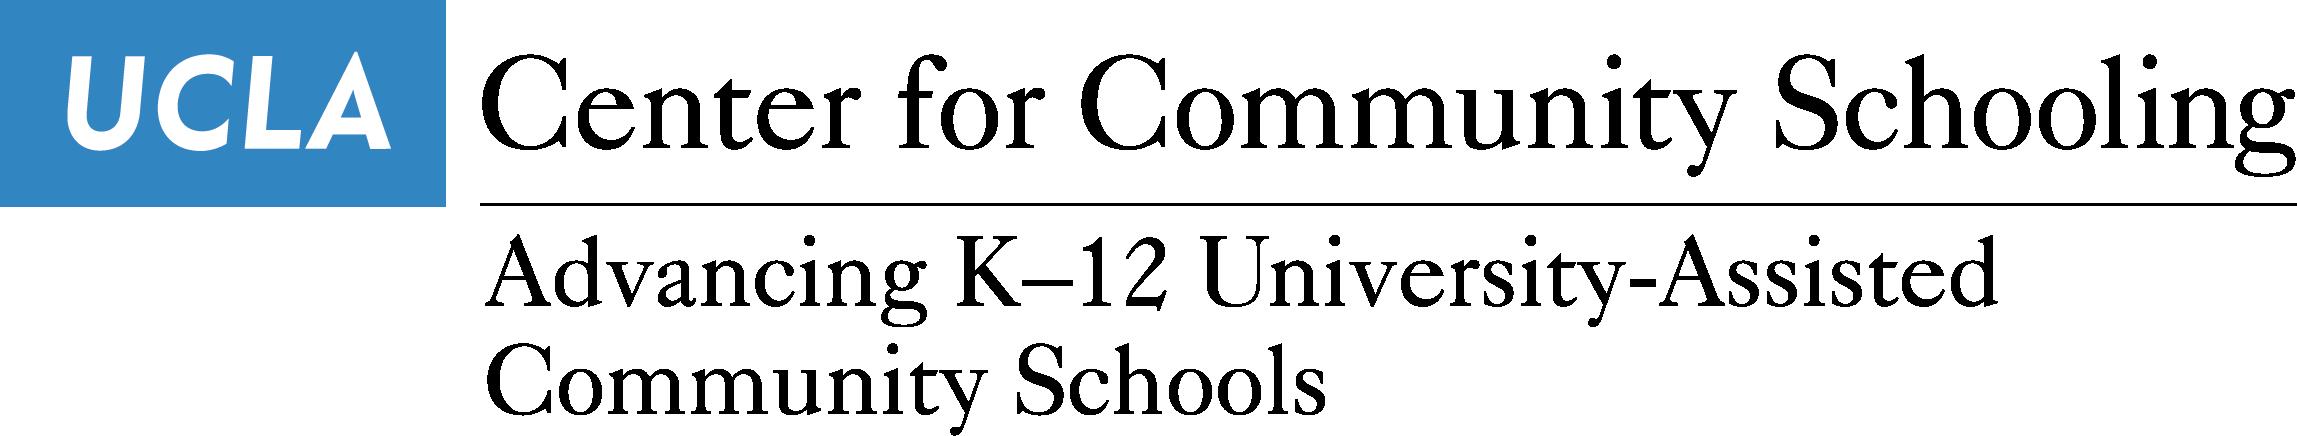 UCLA Community Schooling logo